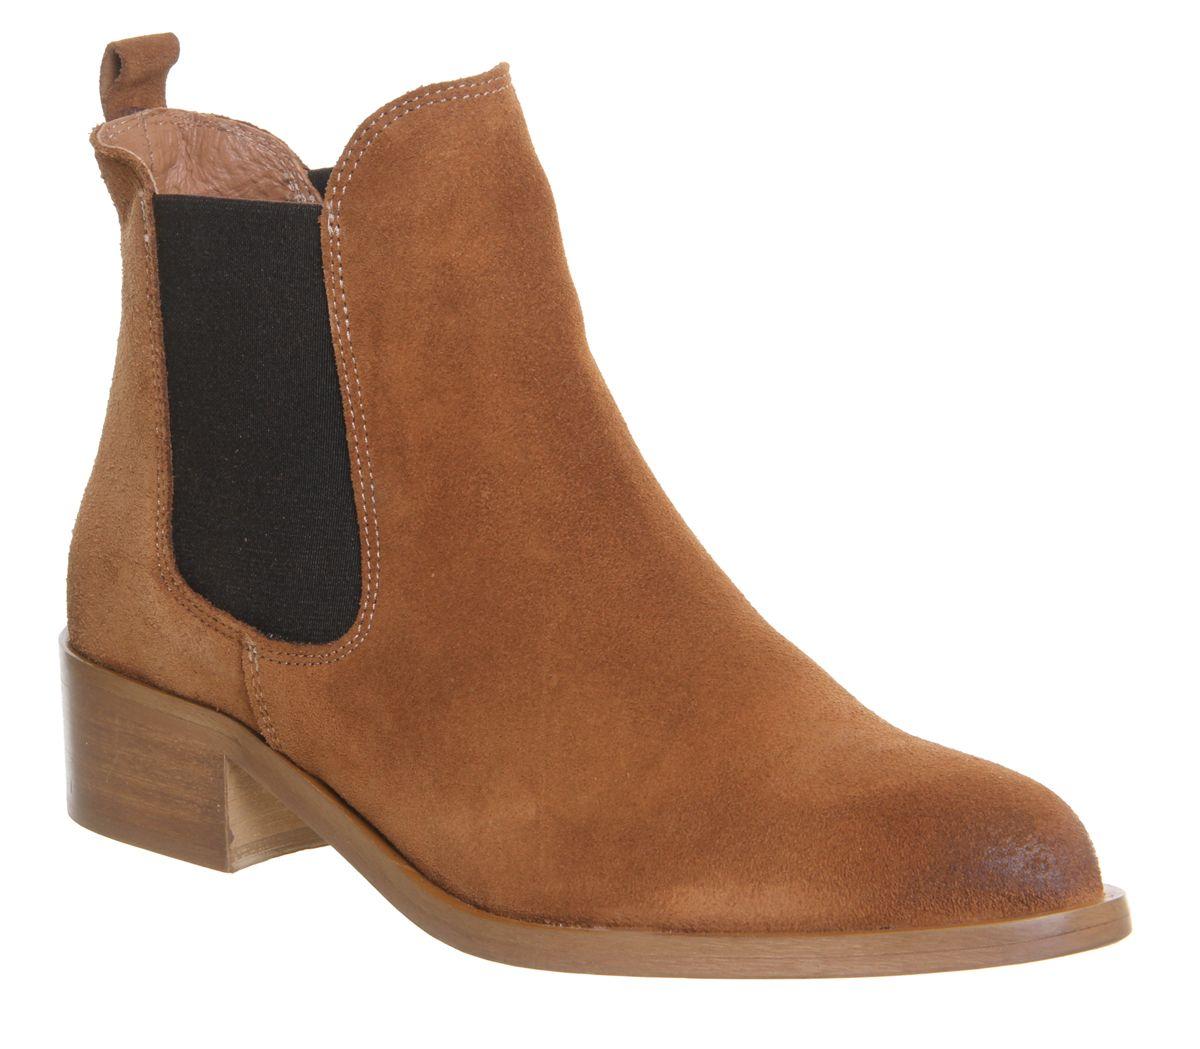 bdcad90e713 Corsa Pointed Low Block Heel Boots